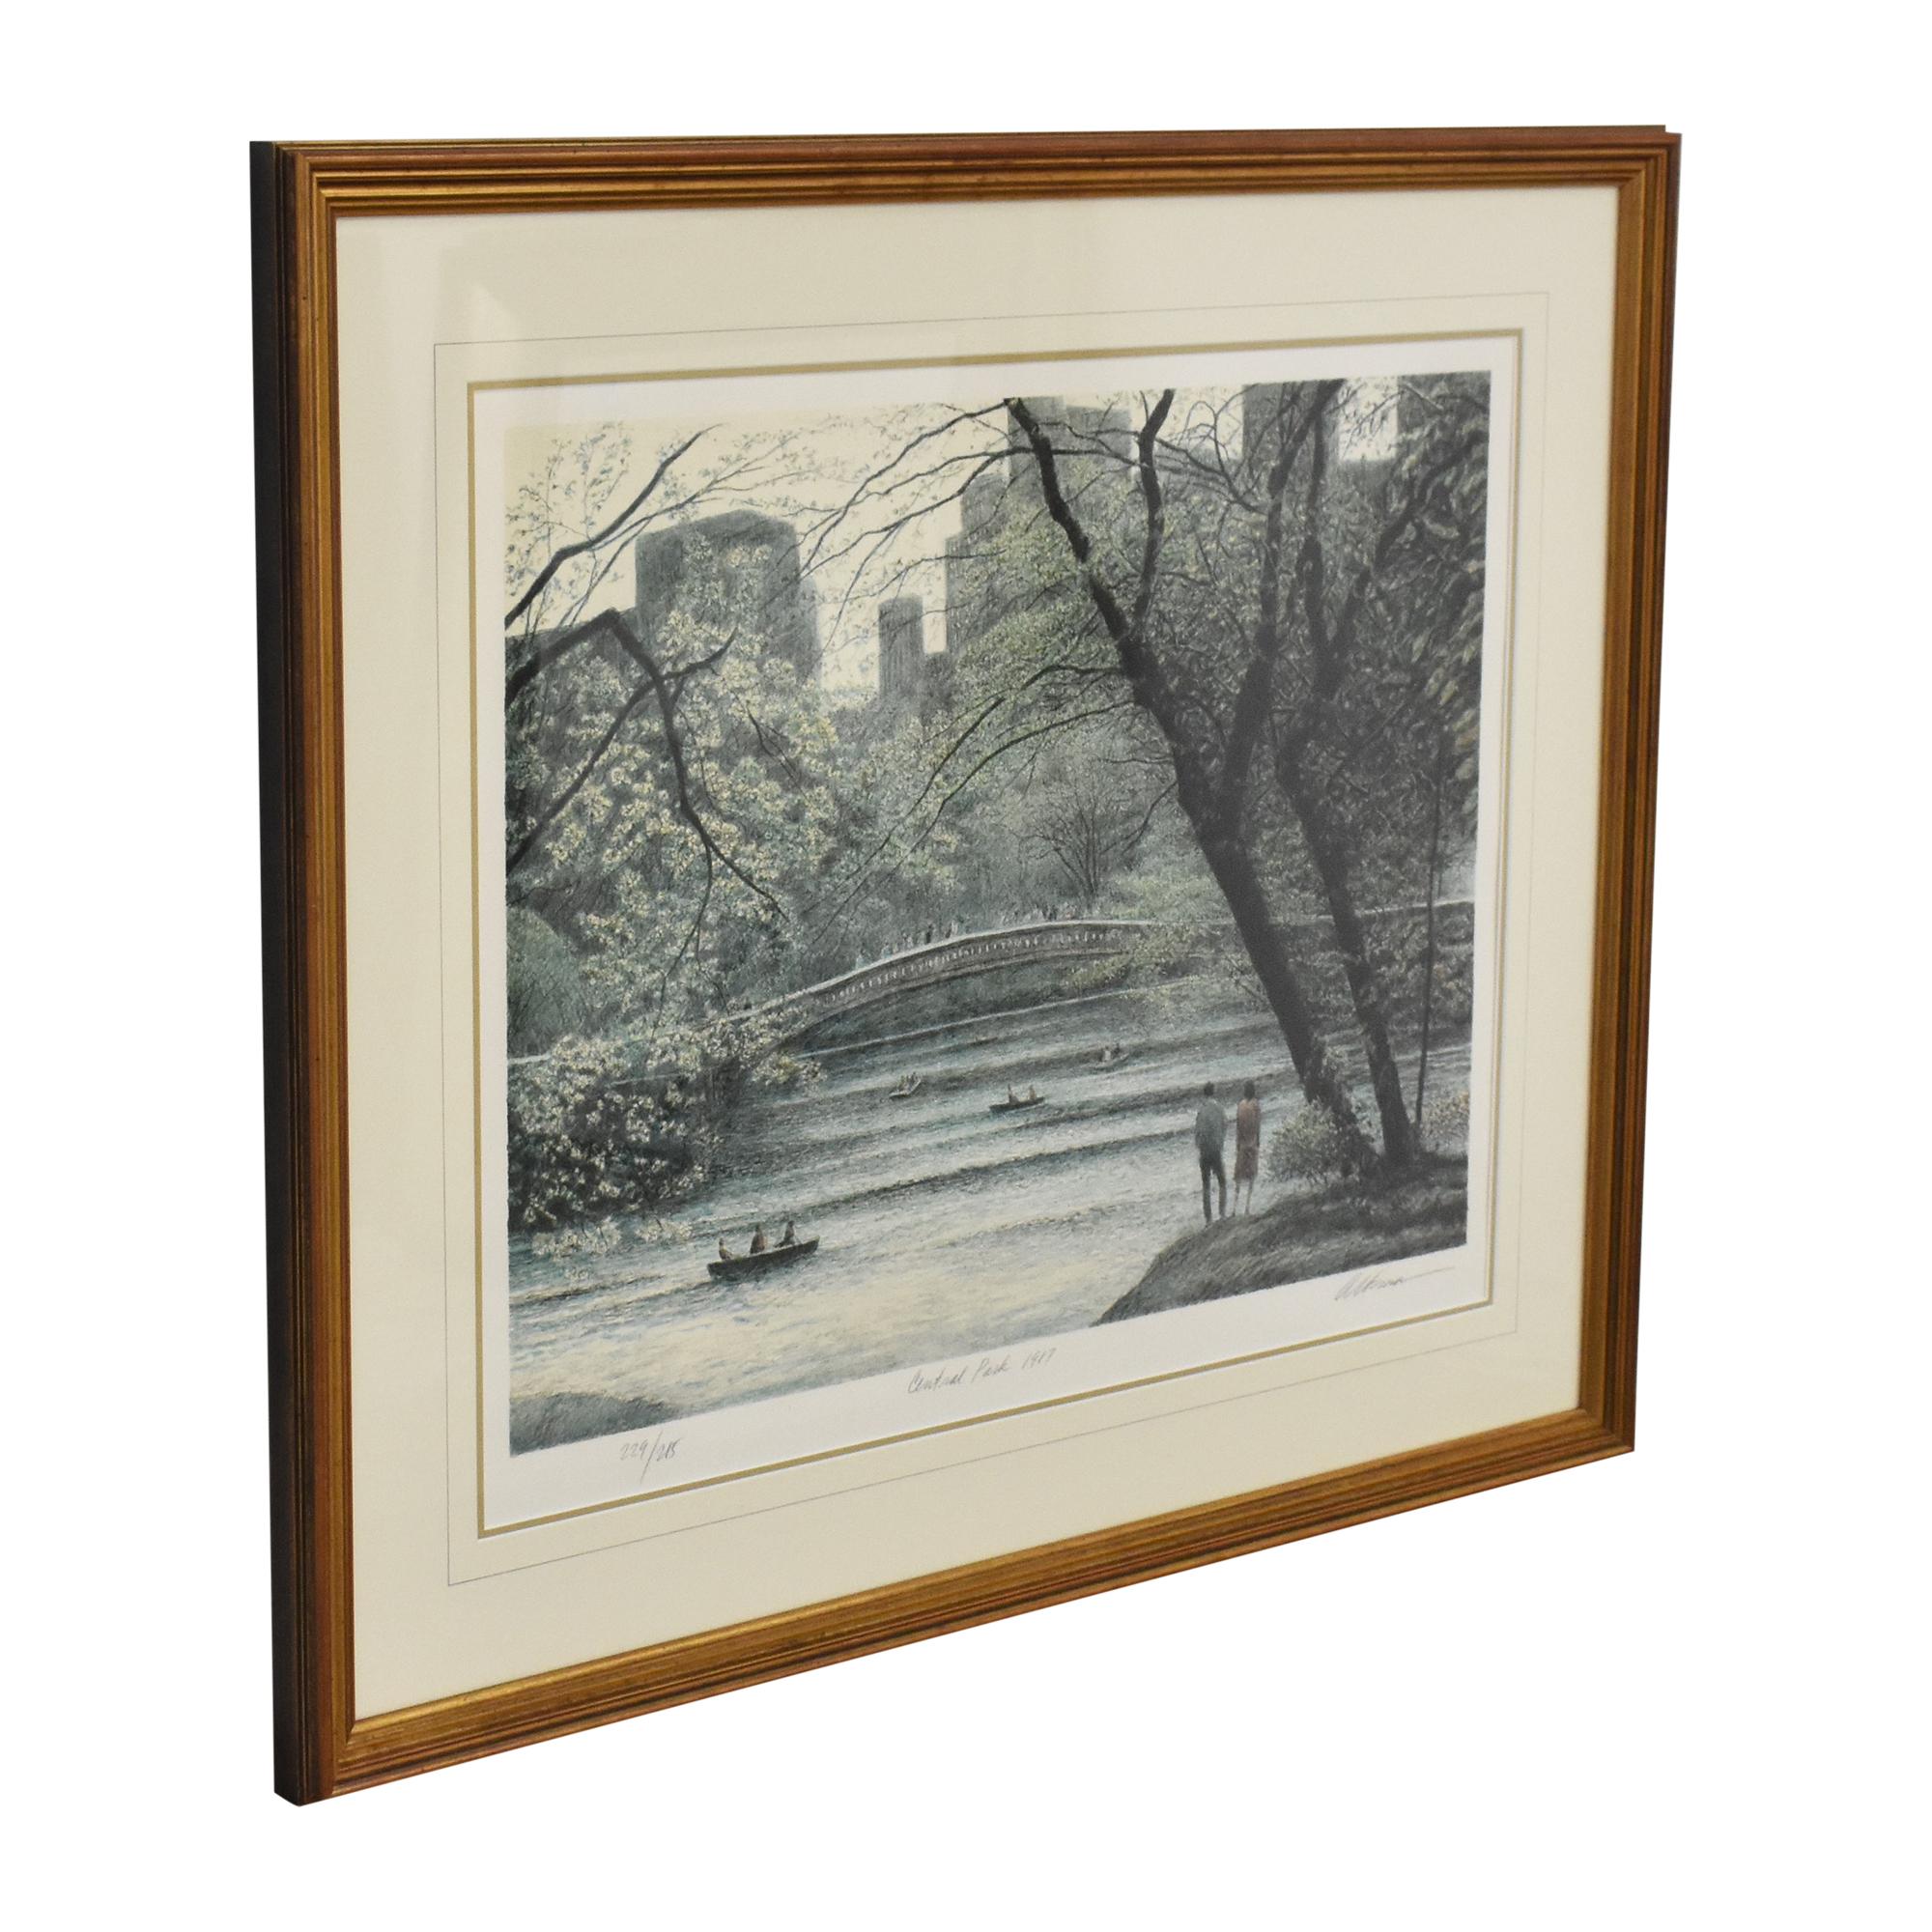 Harold Altman Central Park 1987 New York Print for sale